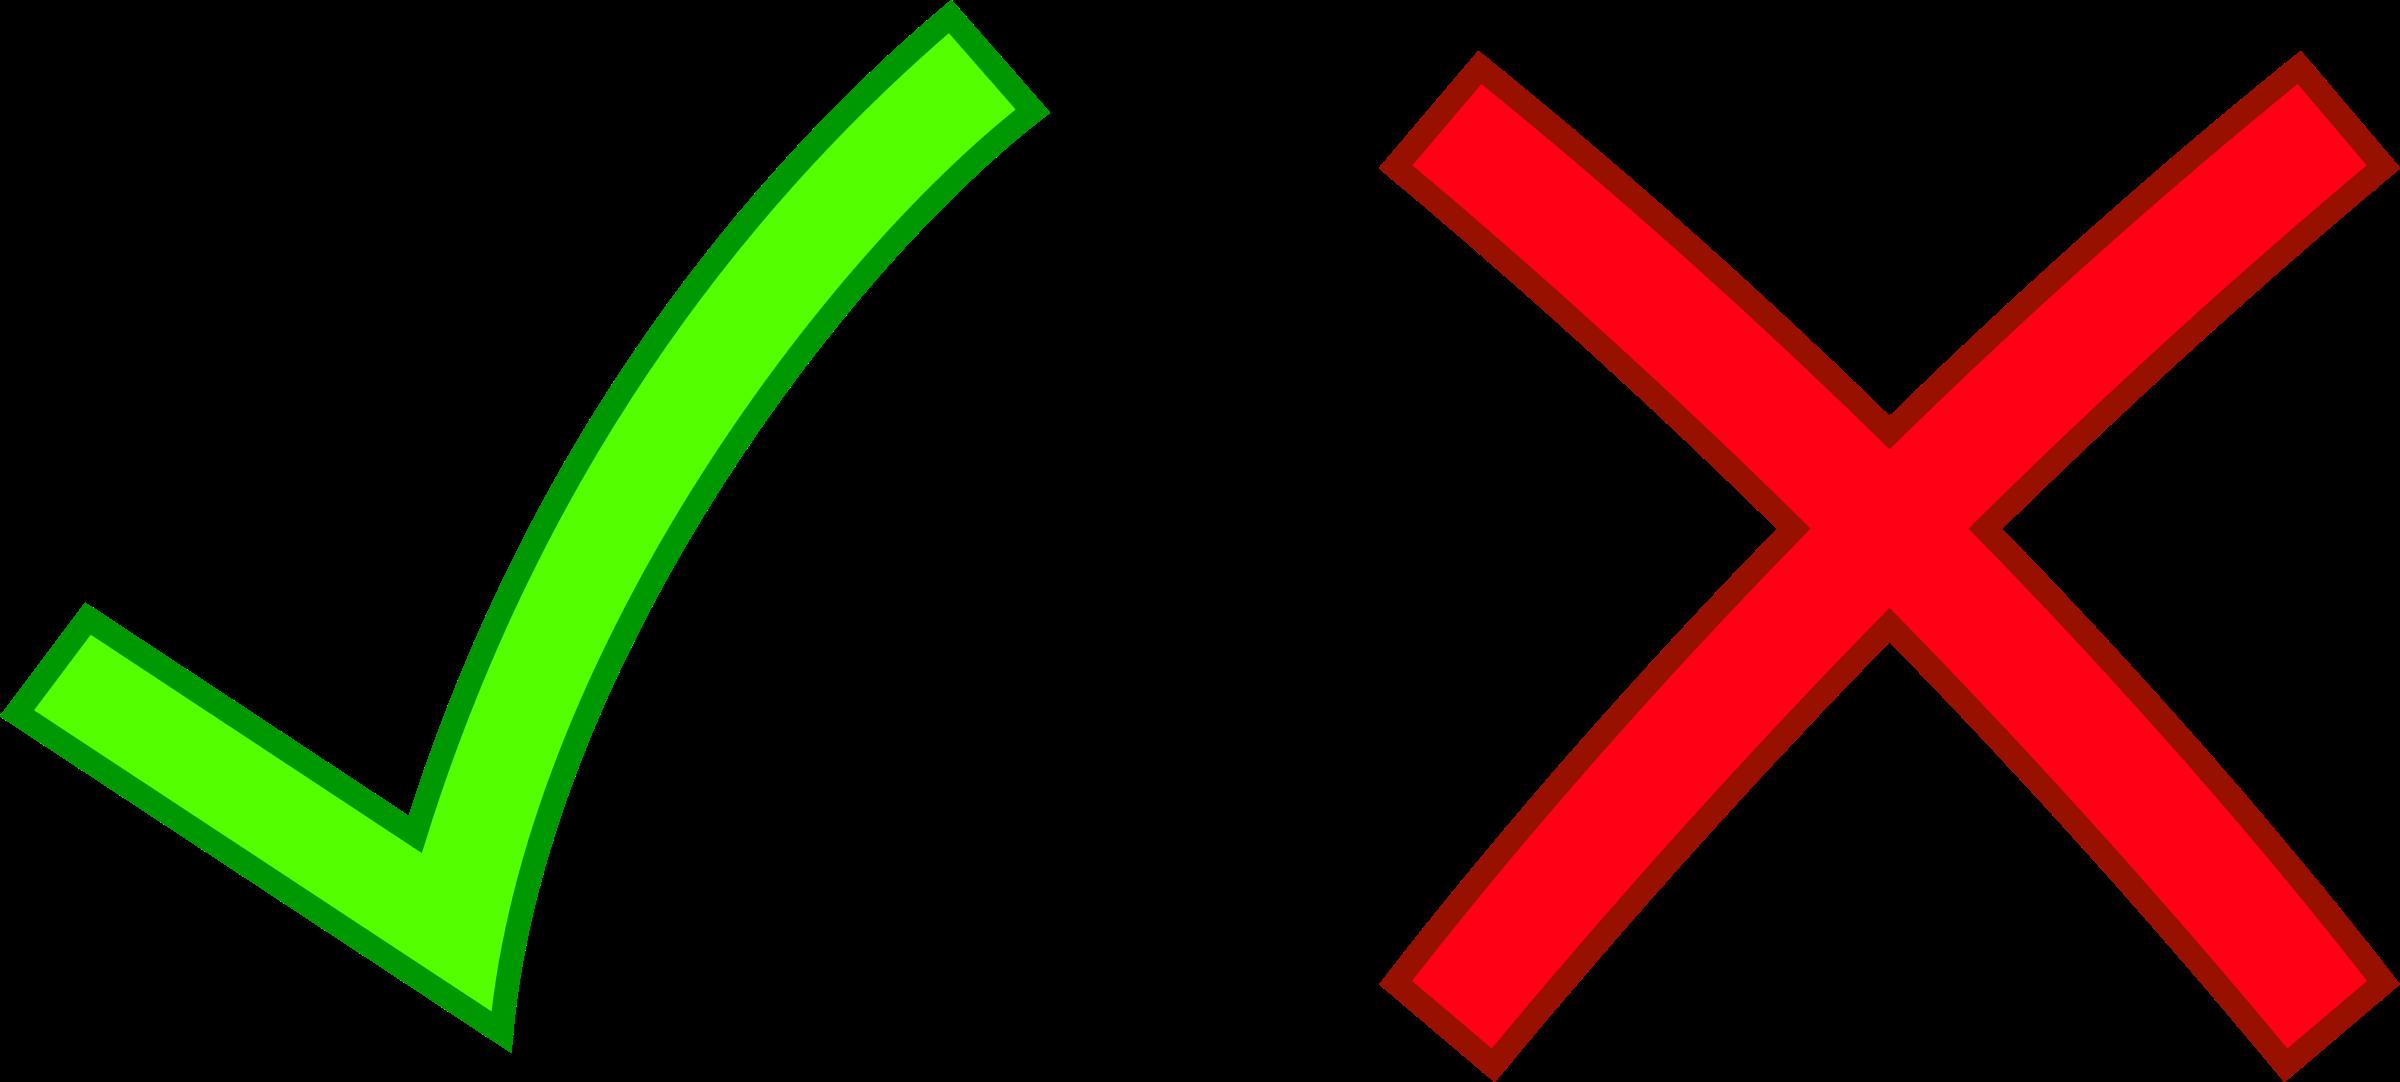 Cross Mark Icon